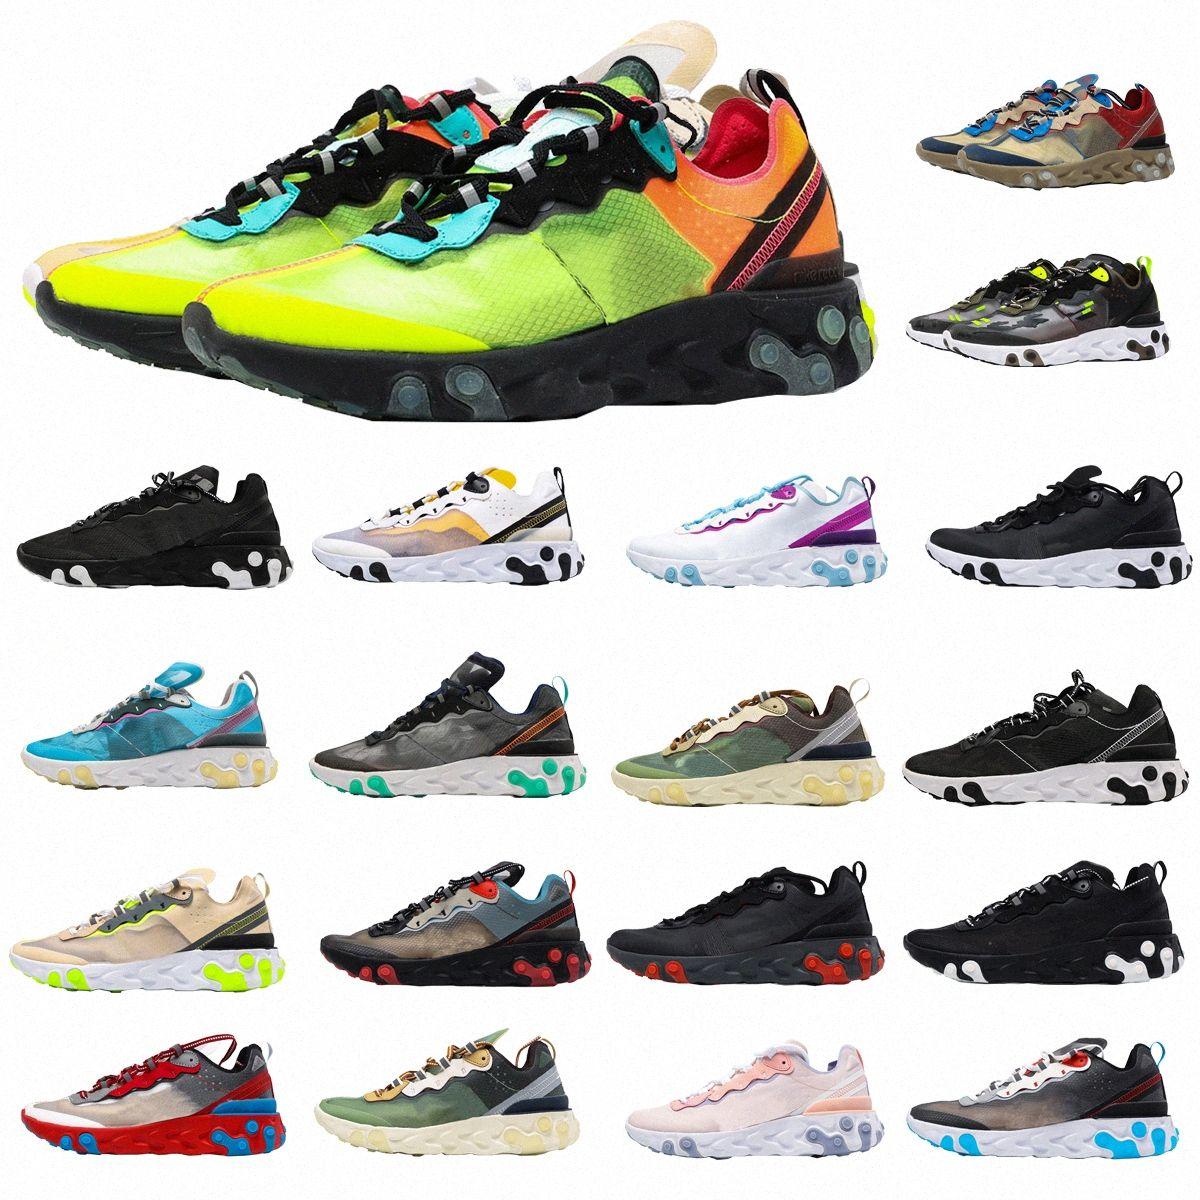 air airmax max Réagir Vision Hommes Élément Femmes 87 55 Tennis Chaussures de course en plein air Mens Summit Blanc Schéma Black Iridescent Iridecent Be véritable Sports Swgs0 #